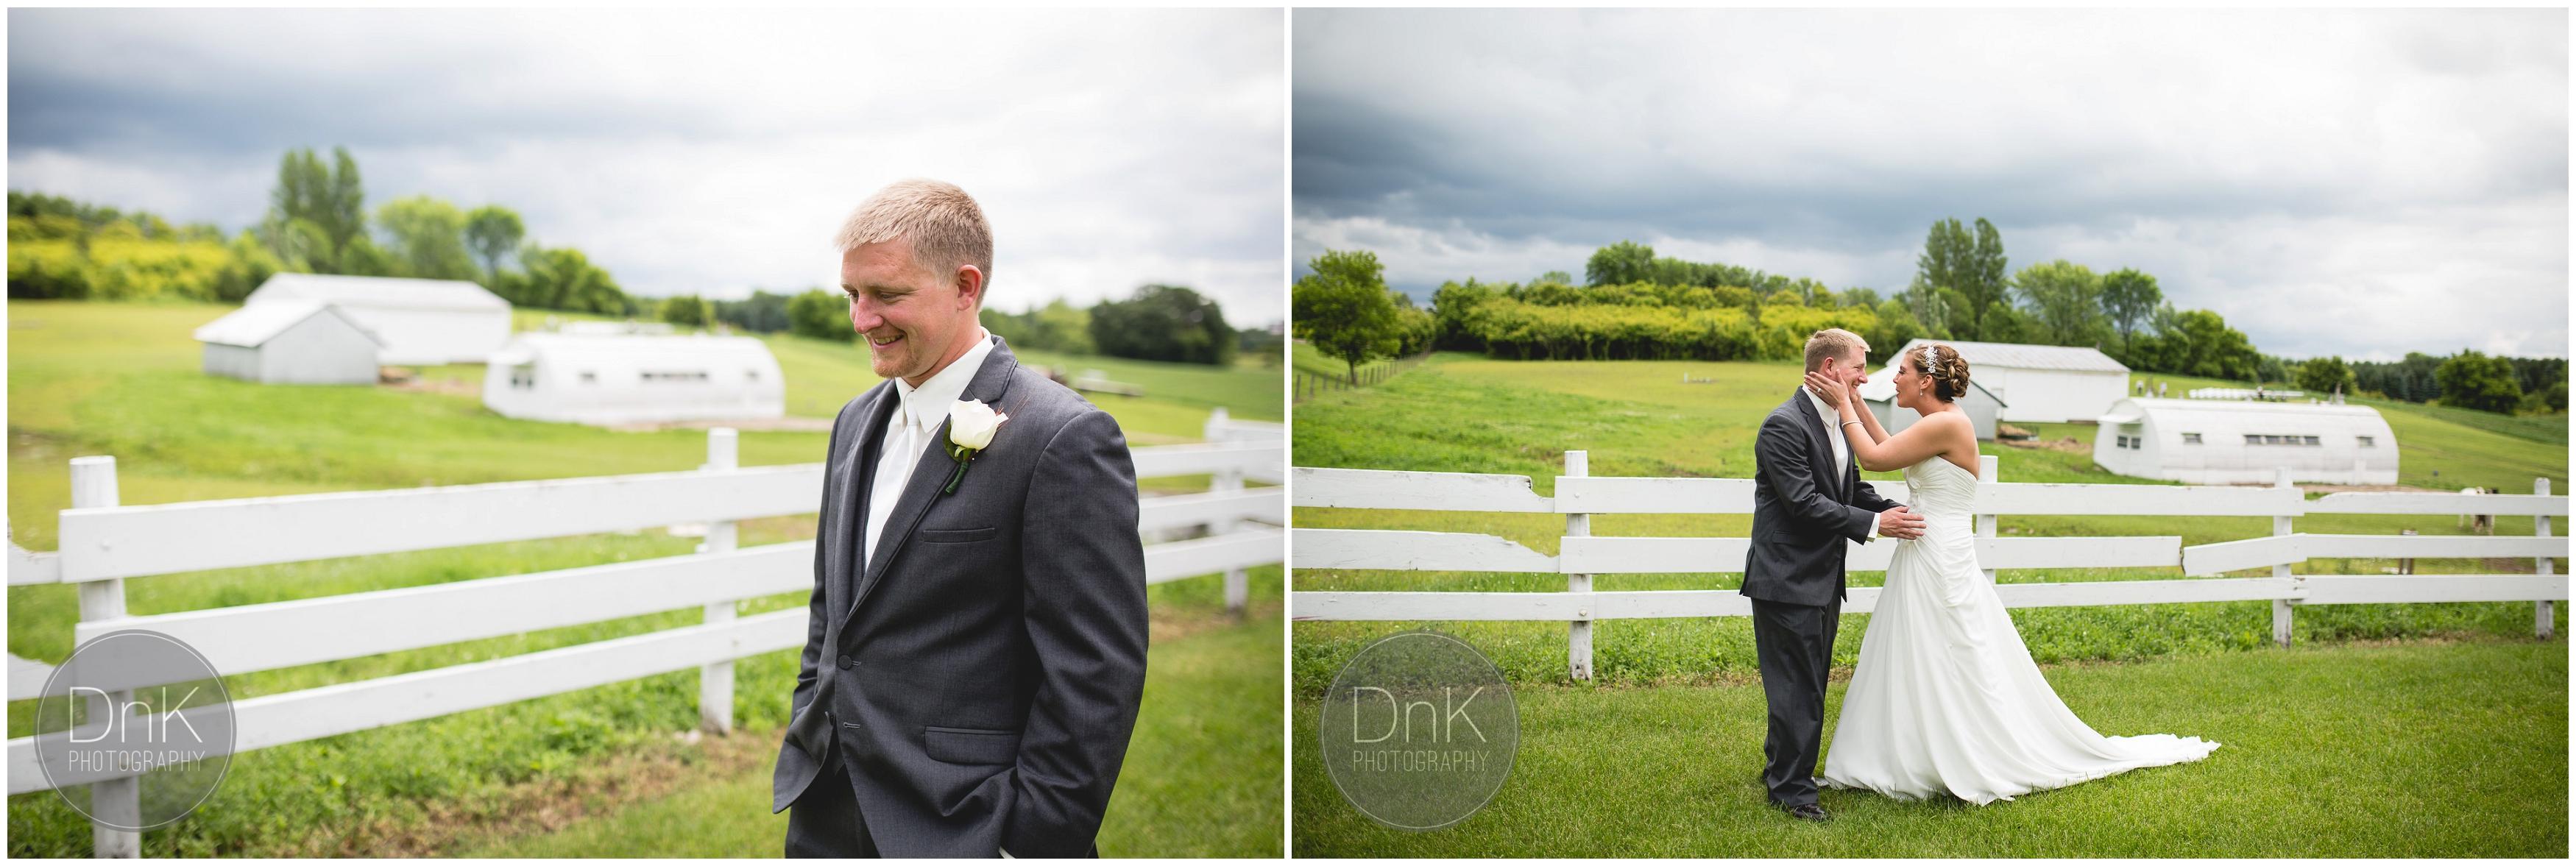 06- Dellwood Barn Wedding Photographer